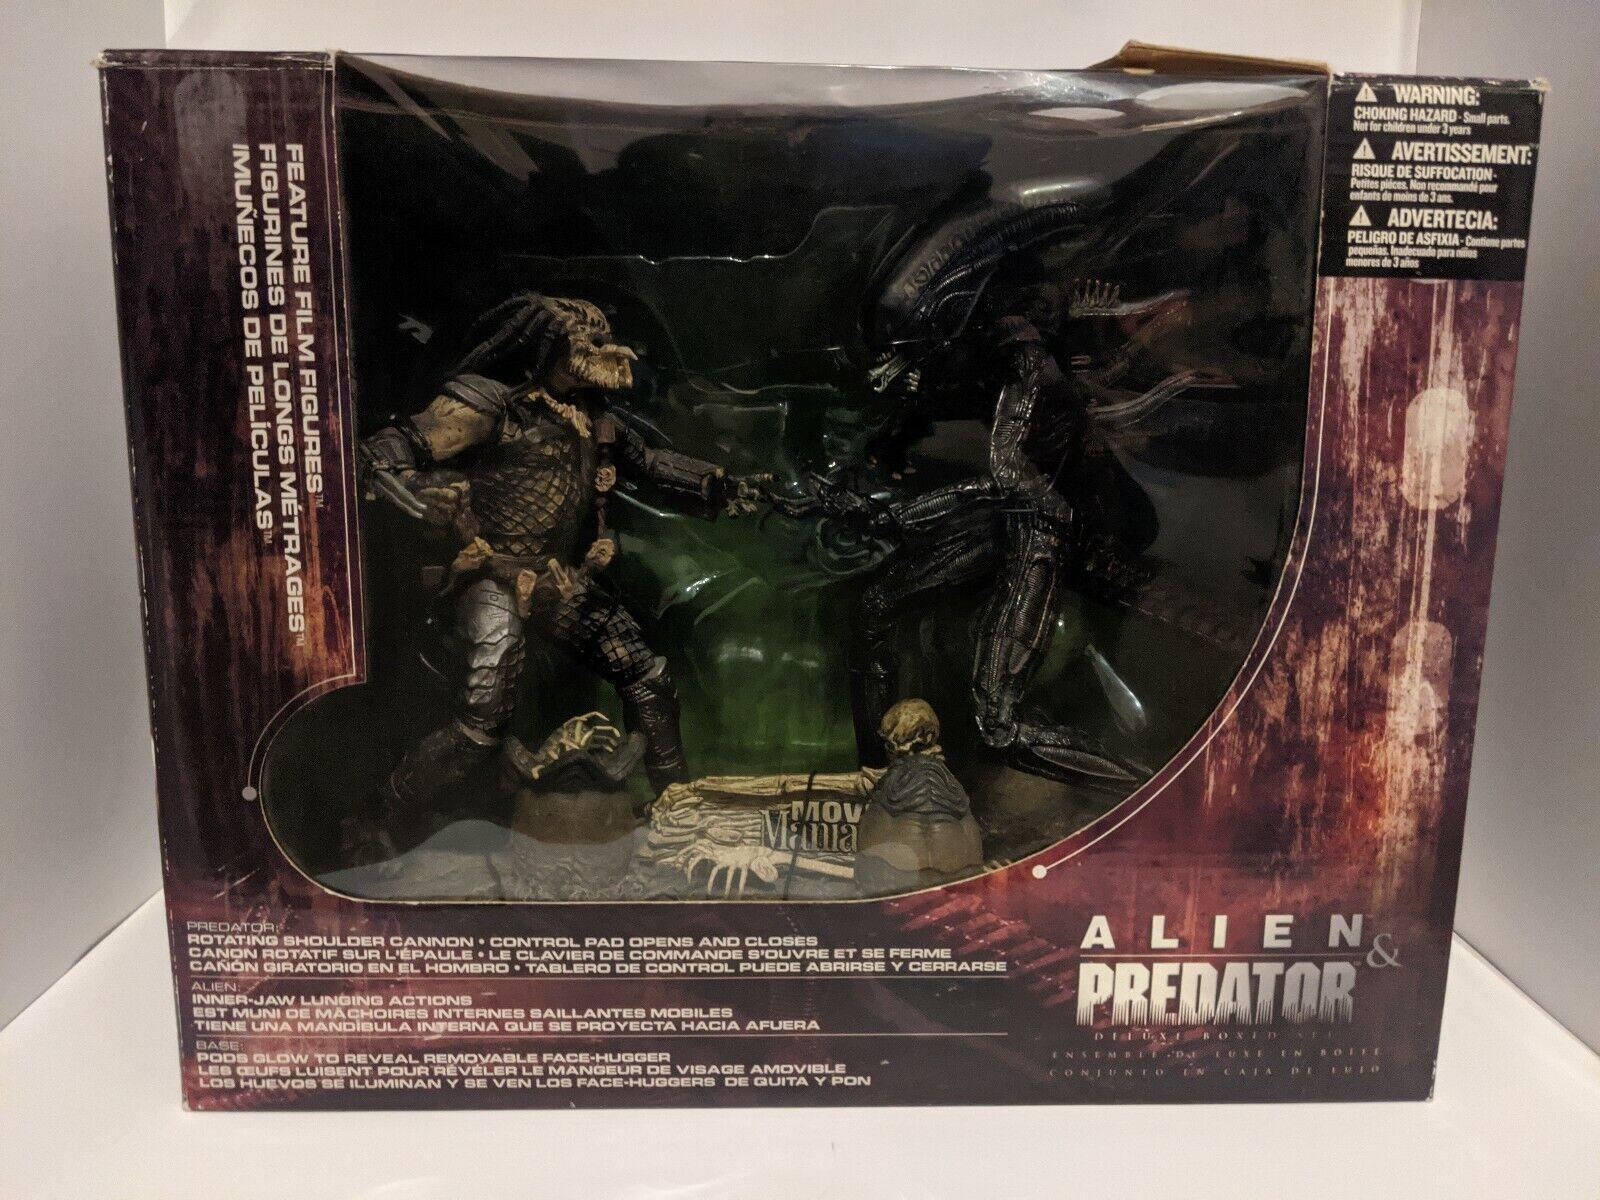 McFarlane Toys Movie Maniacs series 5 Alien and Protator Deluxe Box Set 2002